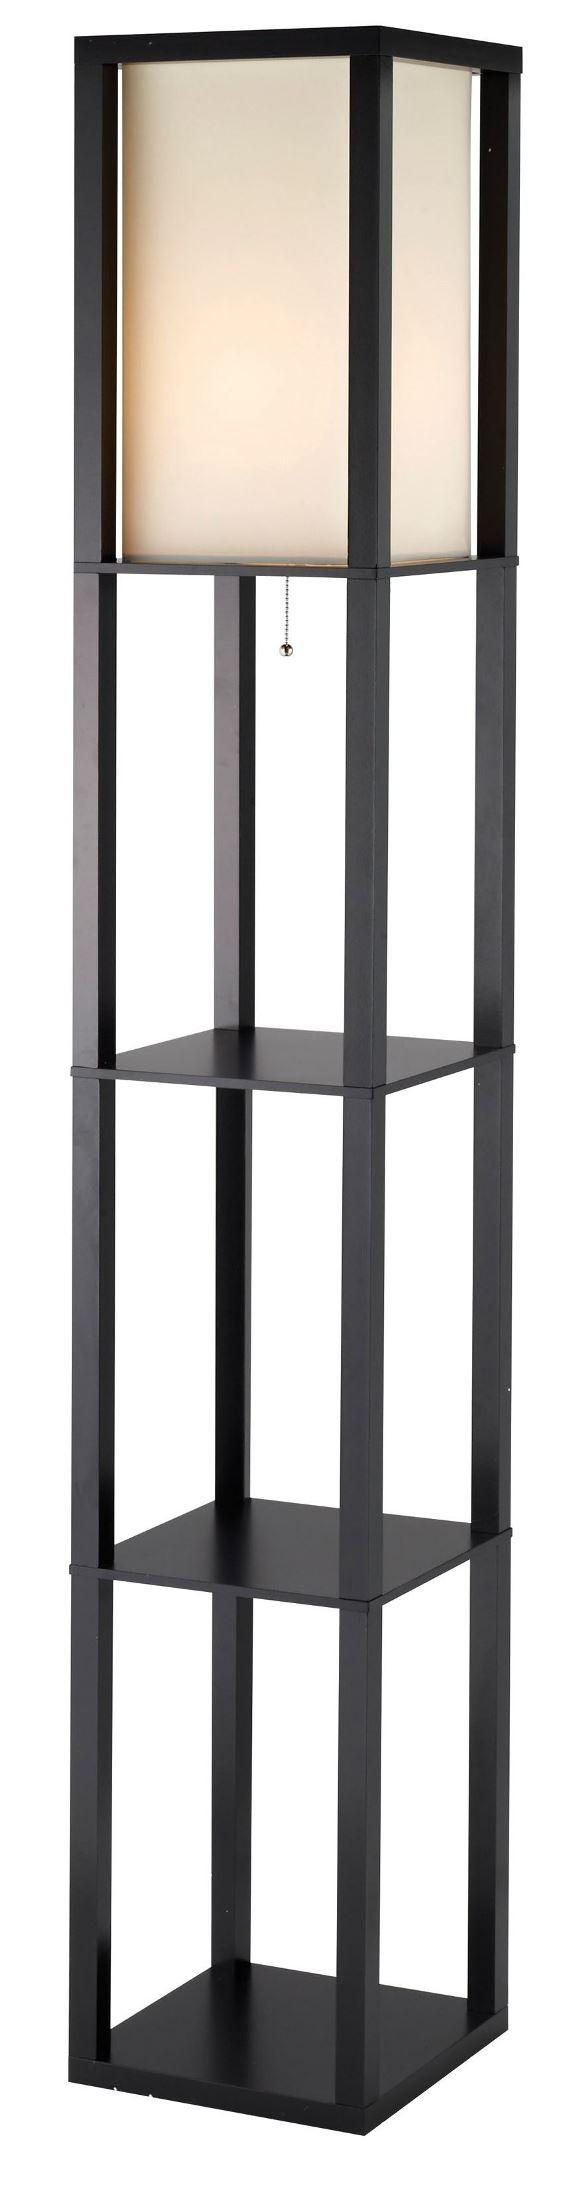 Titan Black Tall Shelf Floor Lamp from Adesso (3193